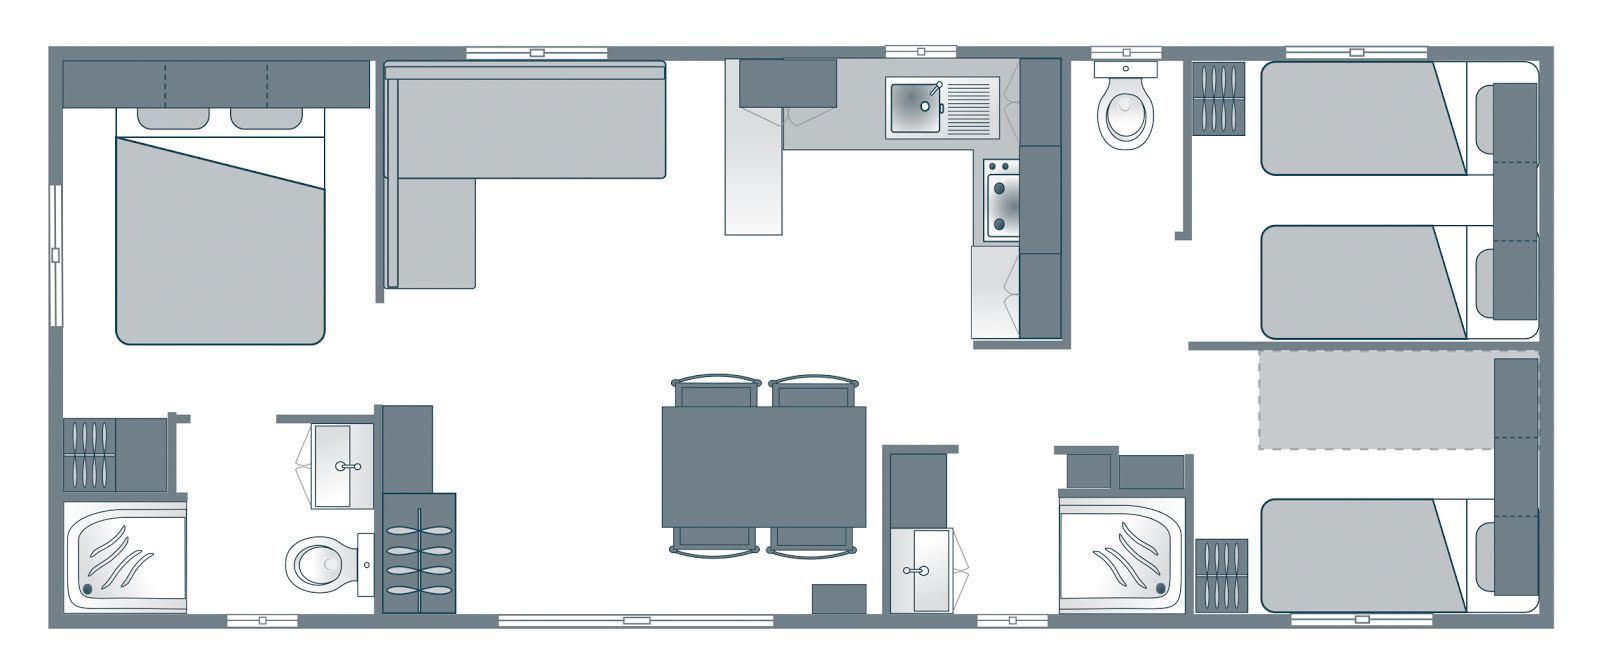 5c73de01ebf45_prestige-3ch-plan